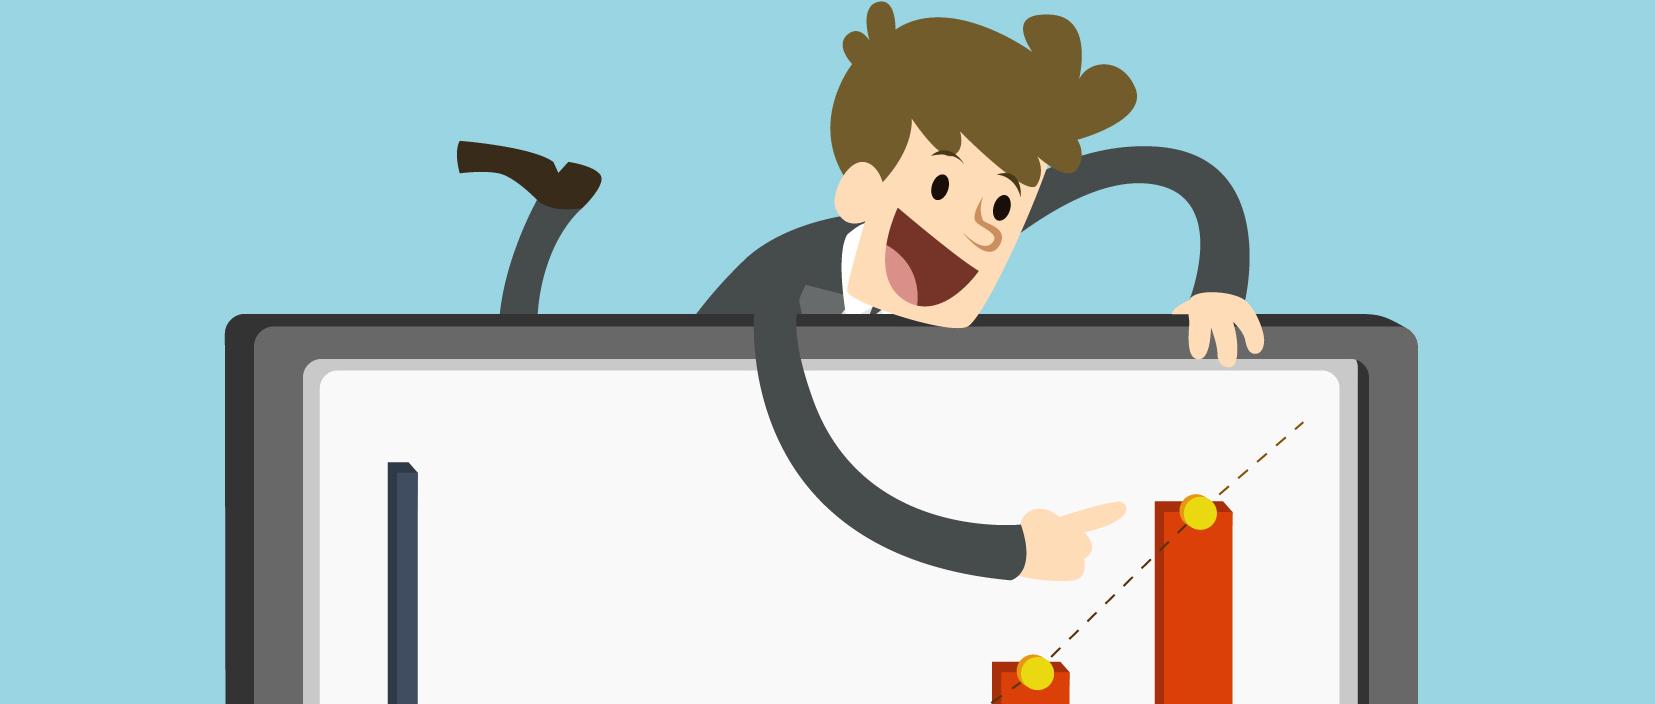 Top website design elements hindering your conversions